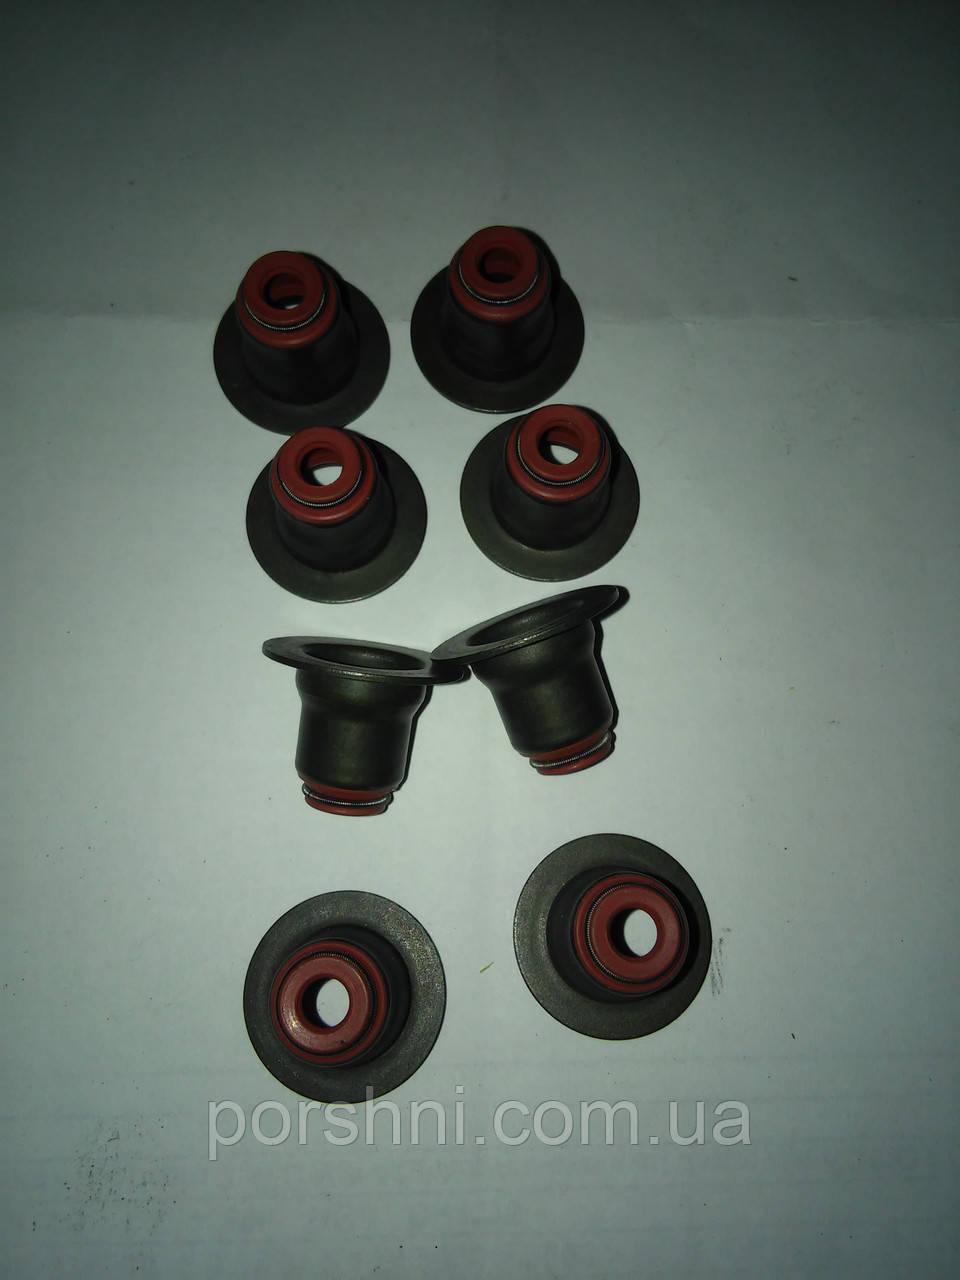 Сальники  клапанов Ford Тransit   2.0 - 2.4  2001 -- 2006 -- VIKTOR REINZ 70-35549-00.1шт